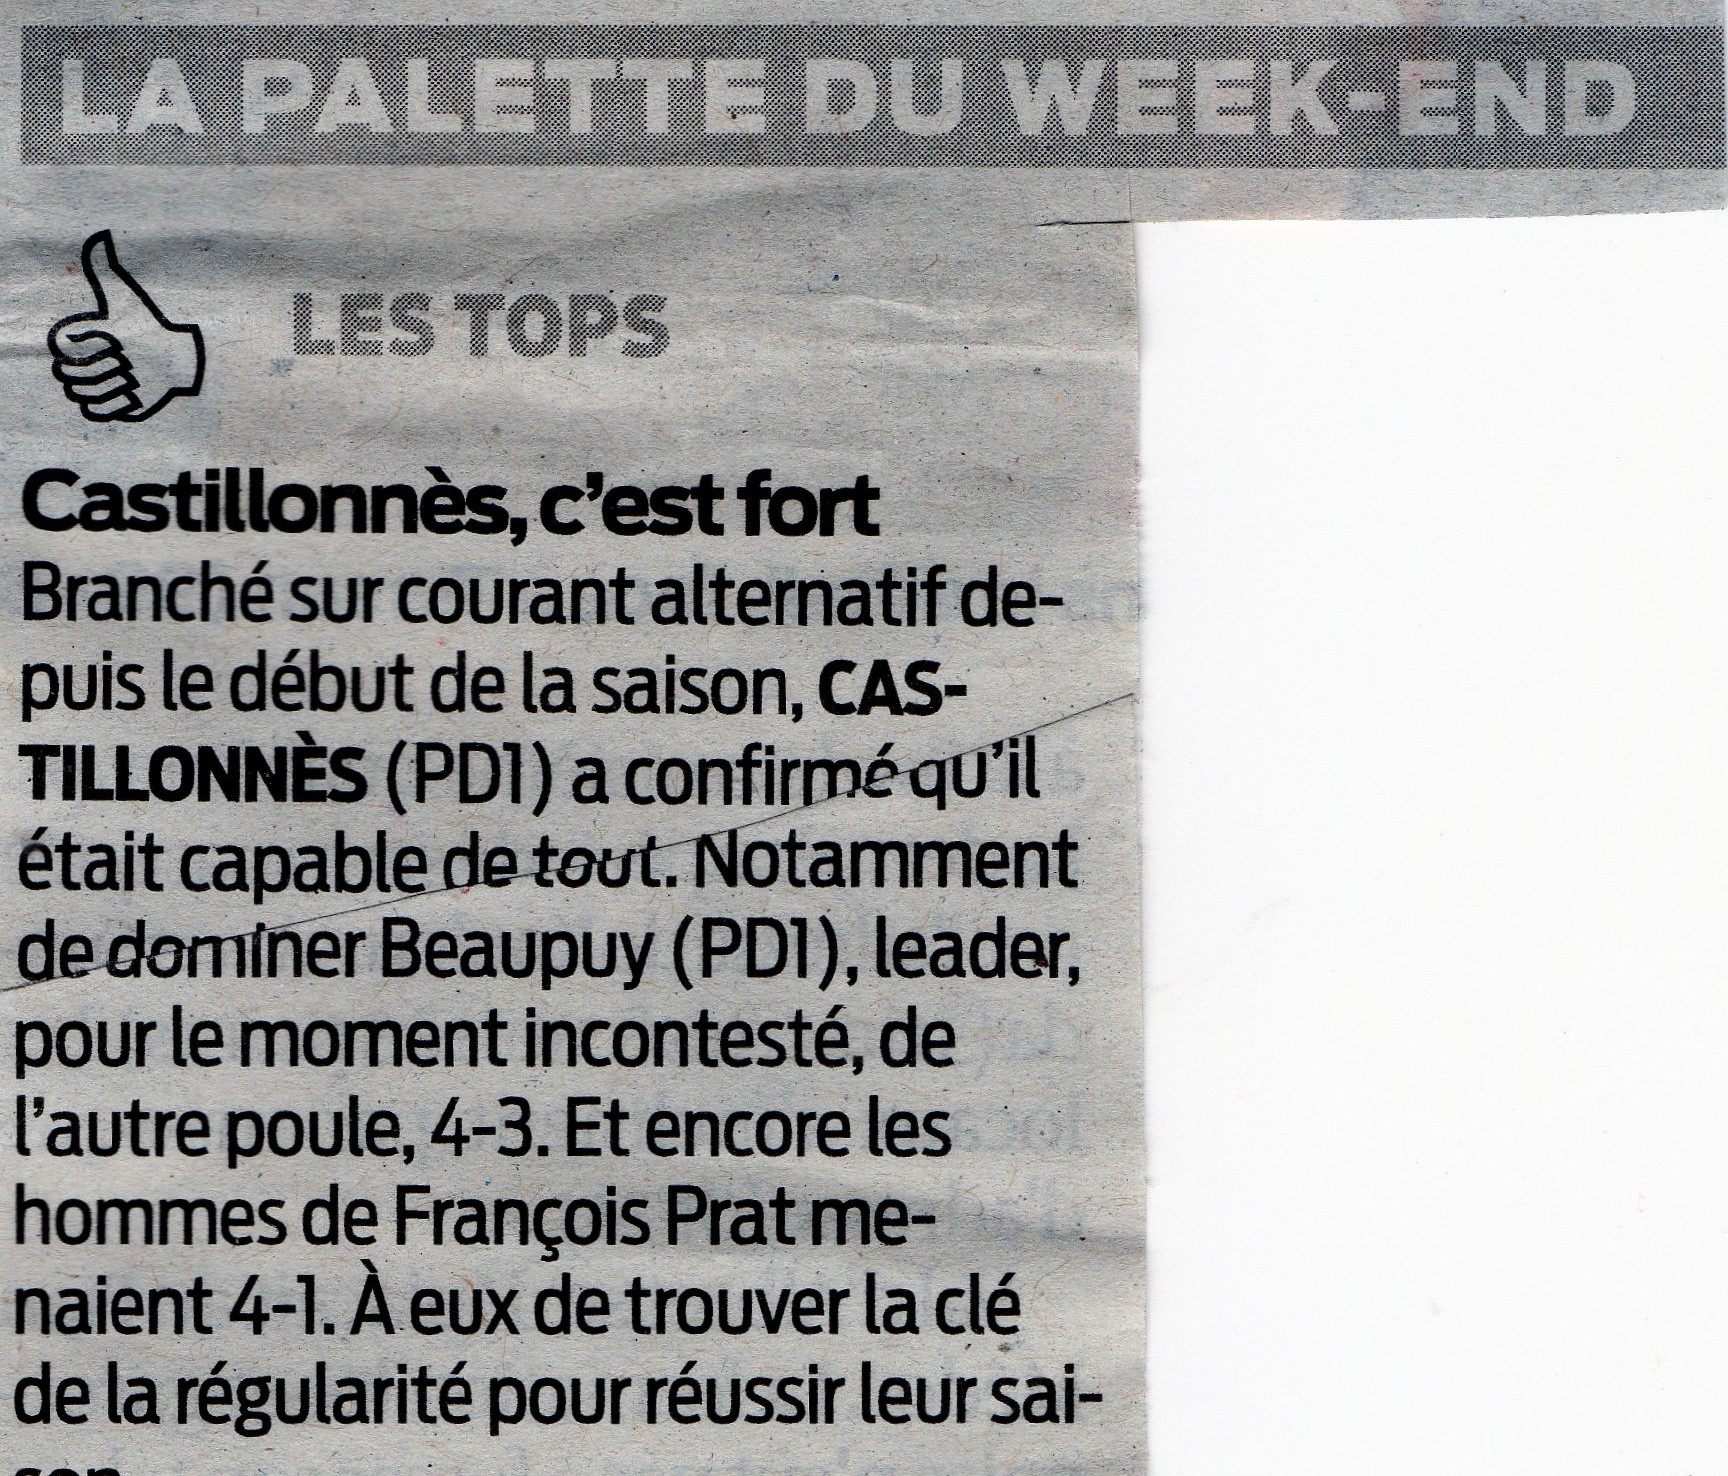 http://staff.footeo.com/uploads/asccl/Medias/article_sud_ouest_du_29_10_2013_beaupuy.jpg